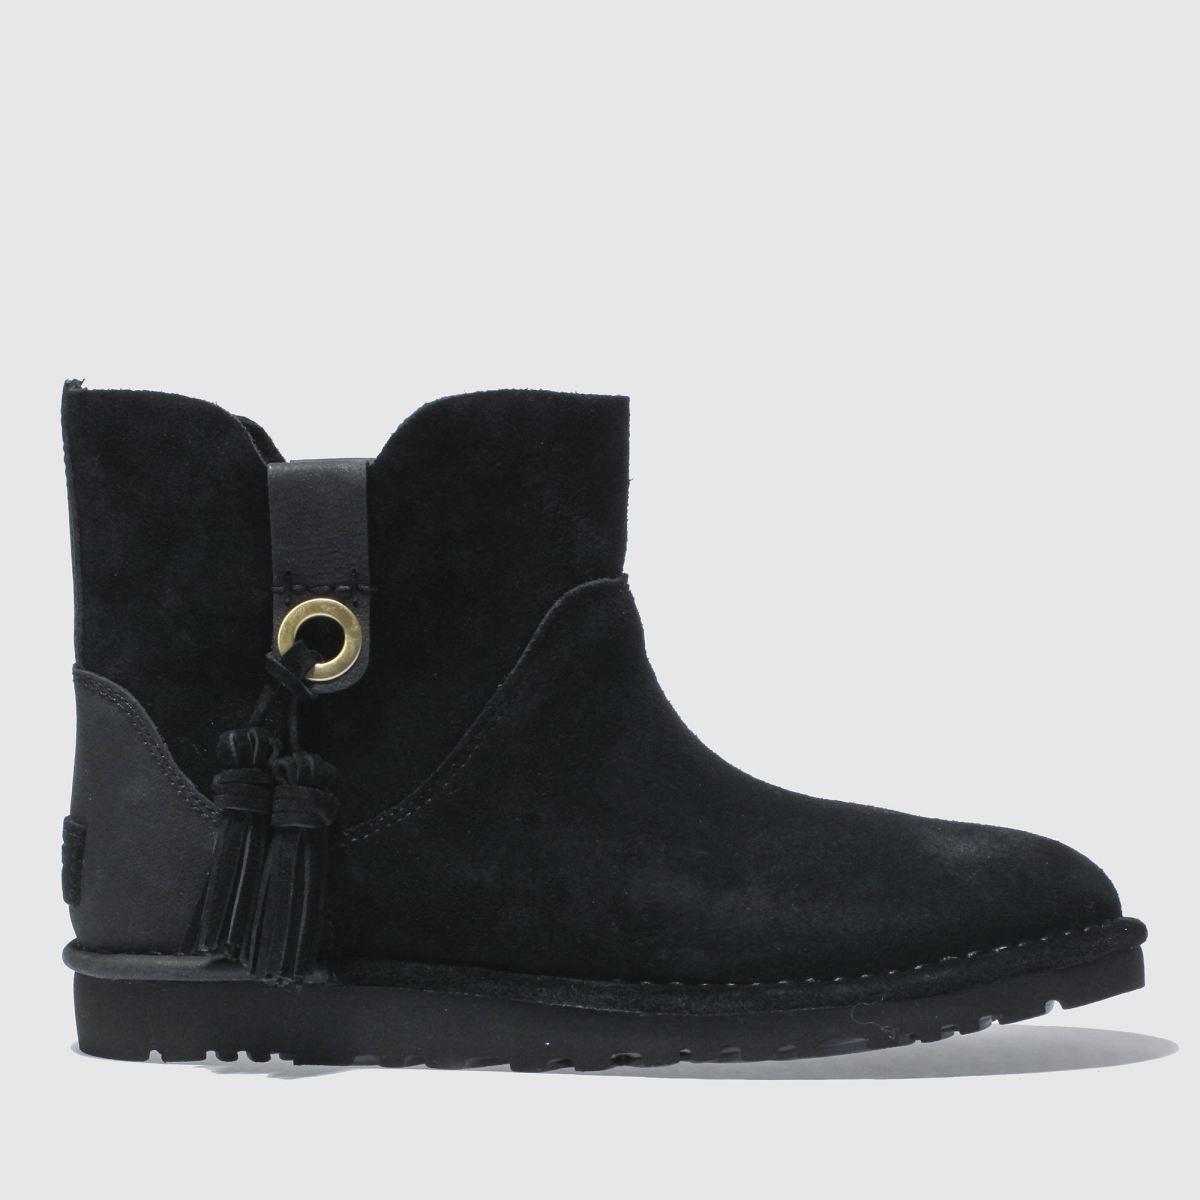 Ugg Black Gib Boots